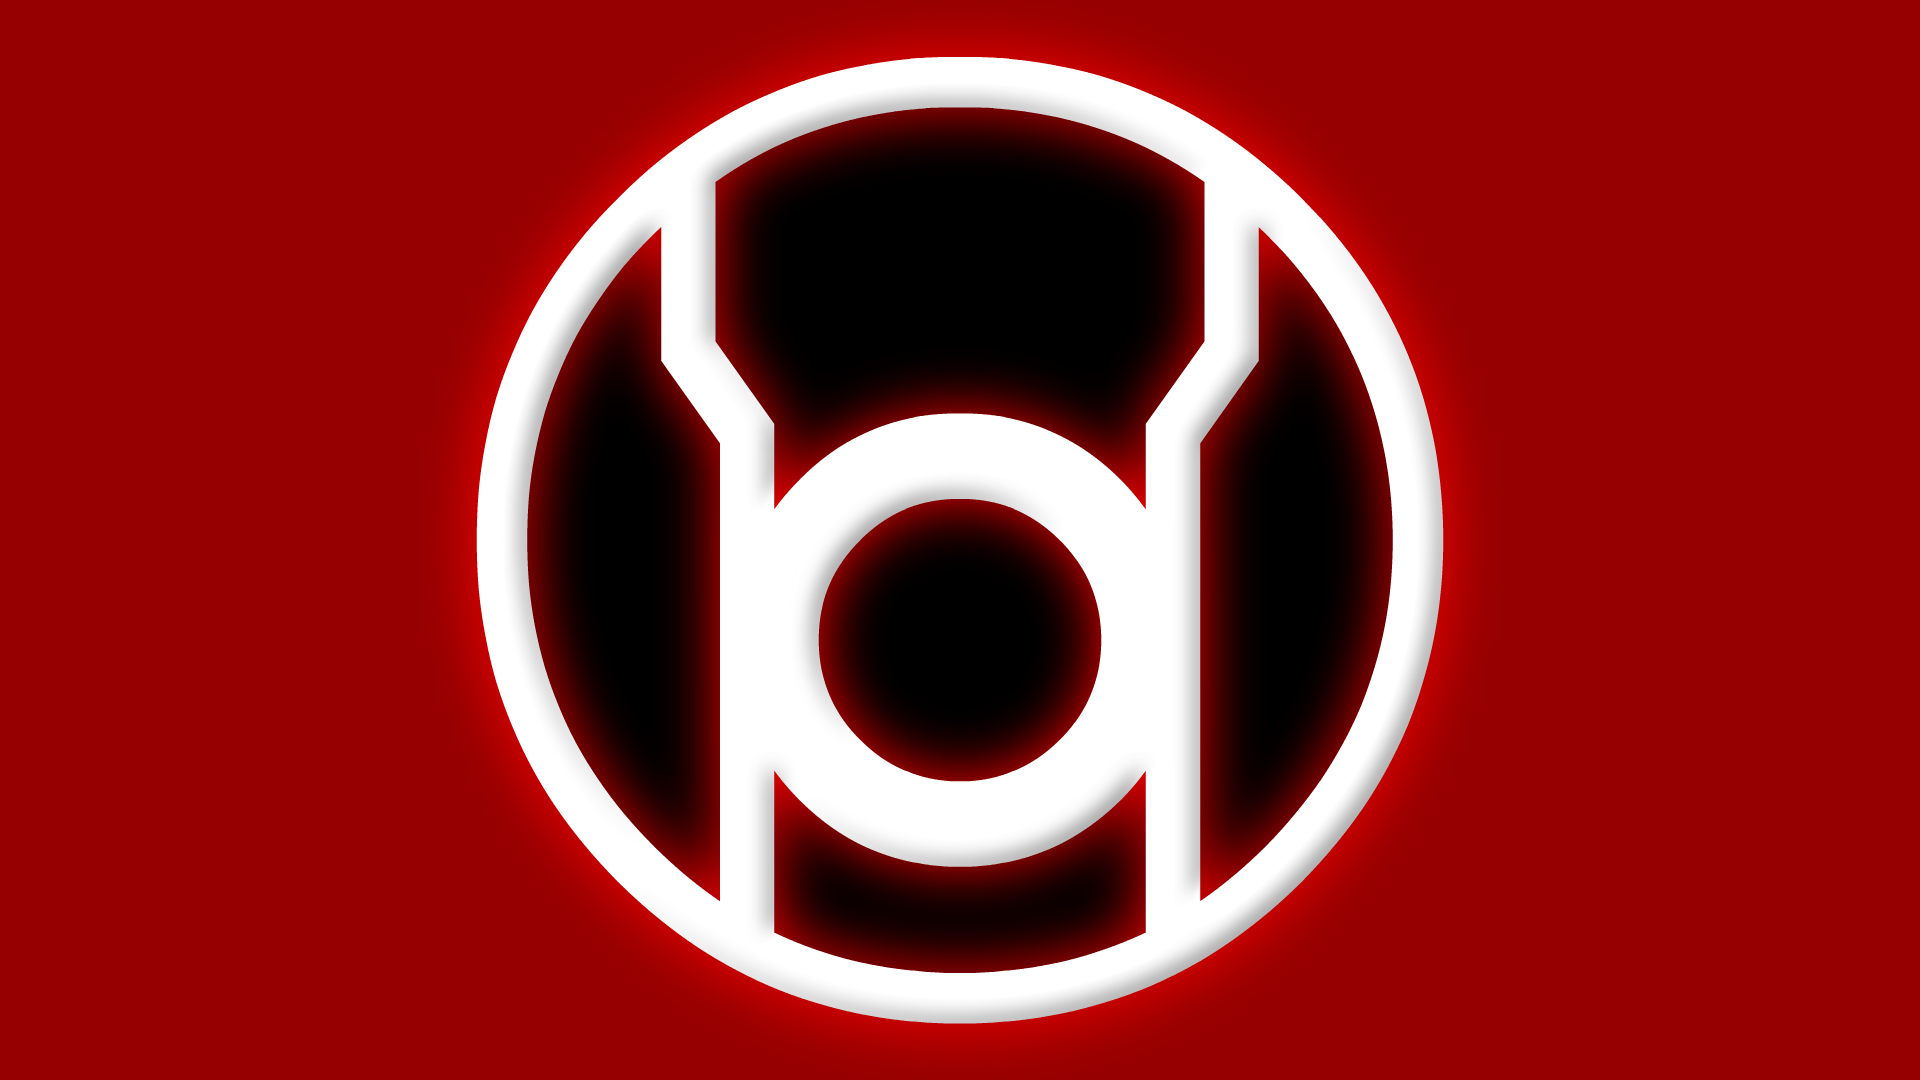 red lantern symbol by yurtigo on deviantart